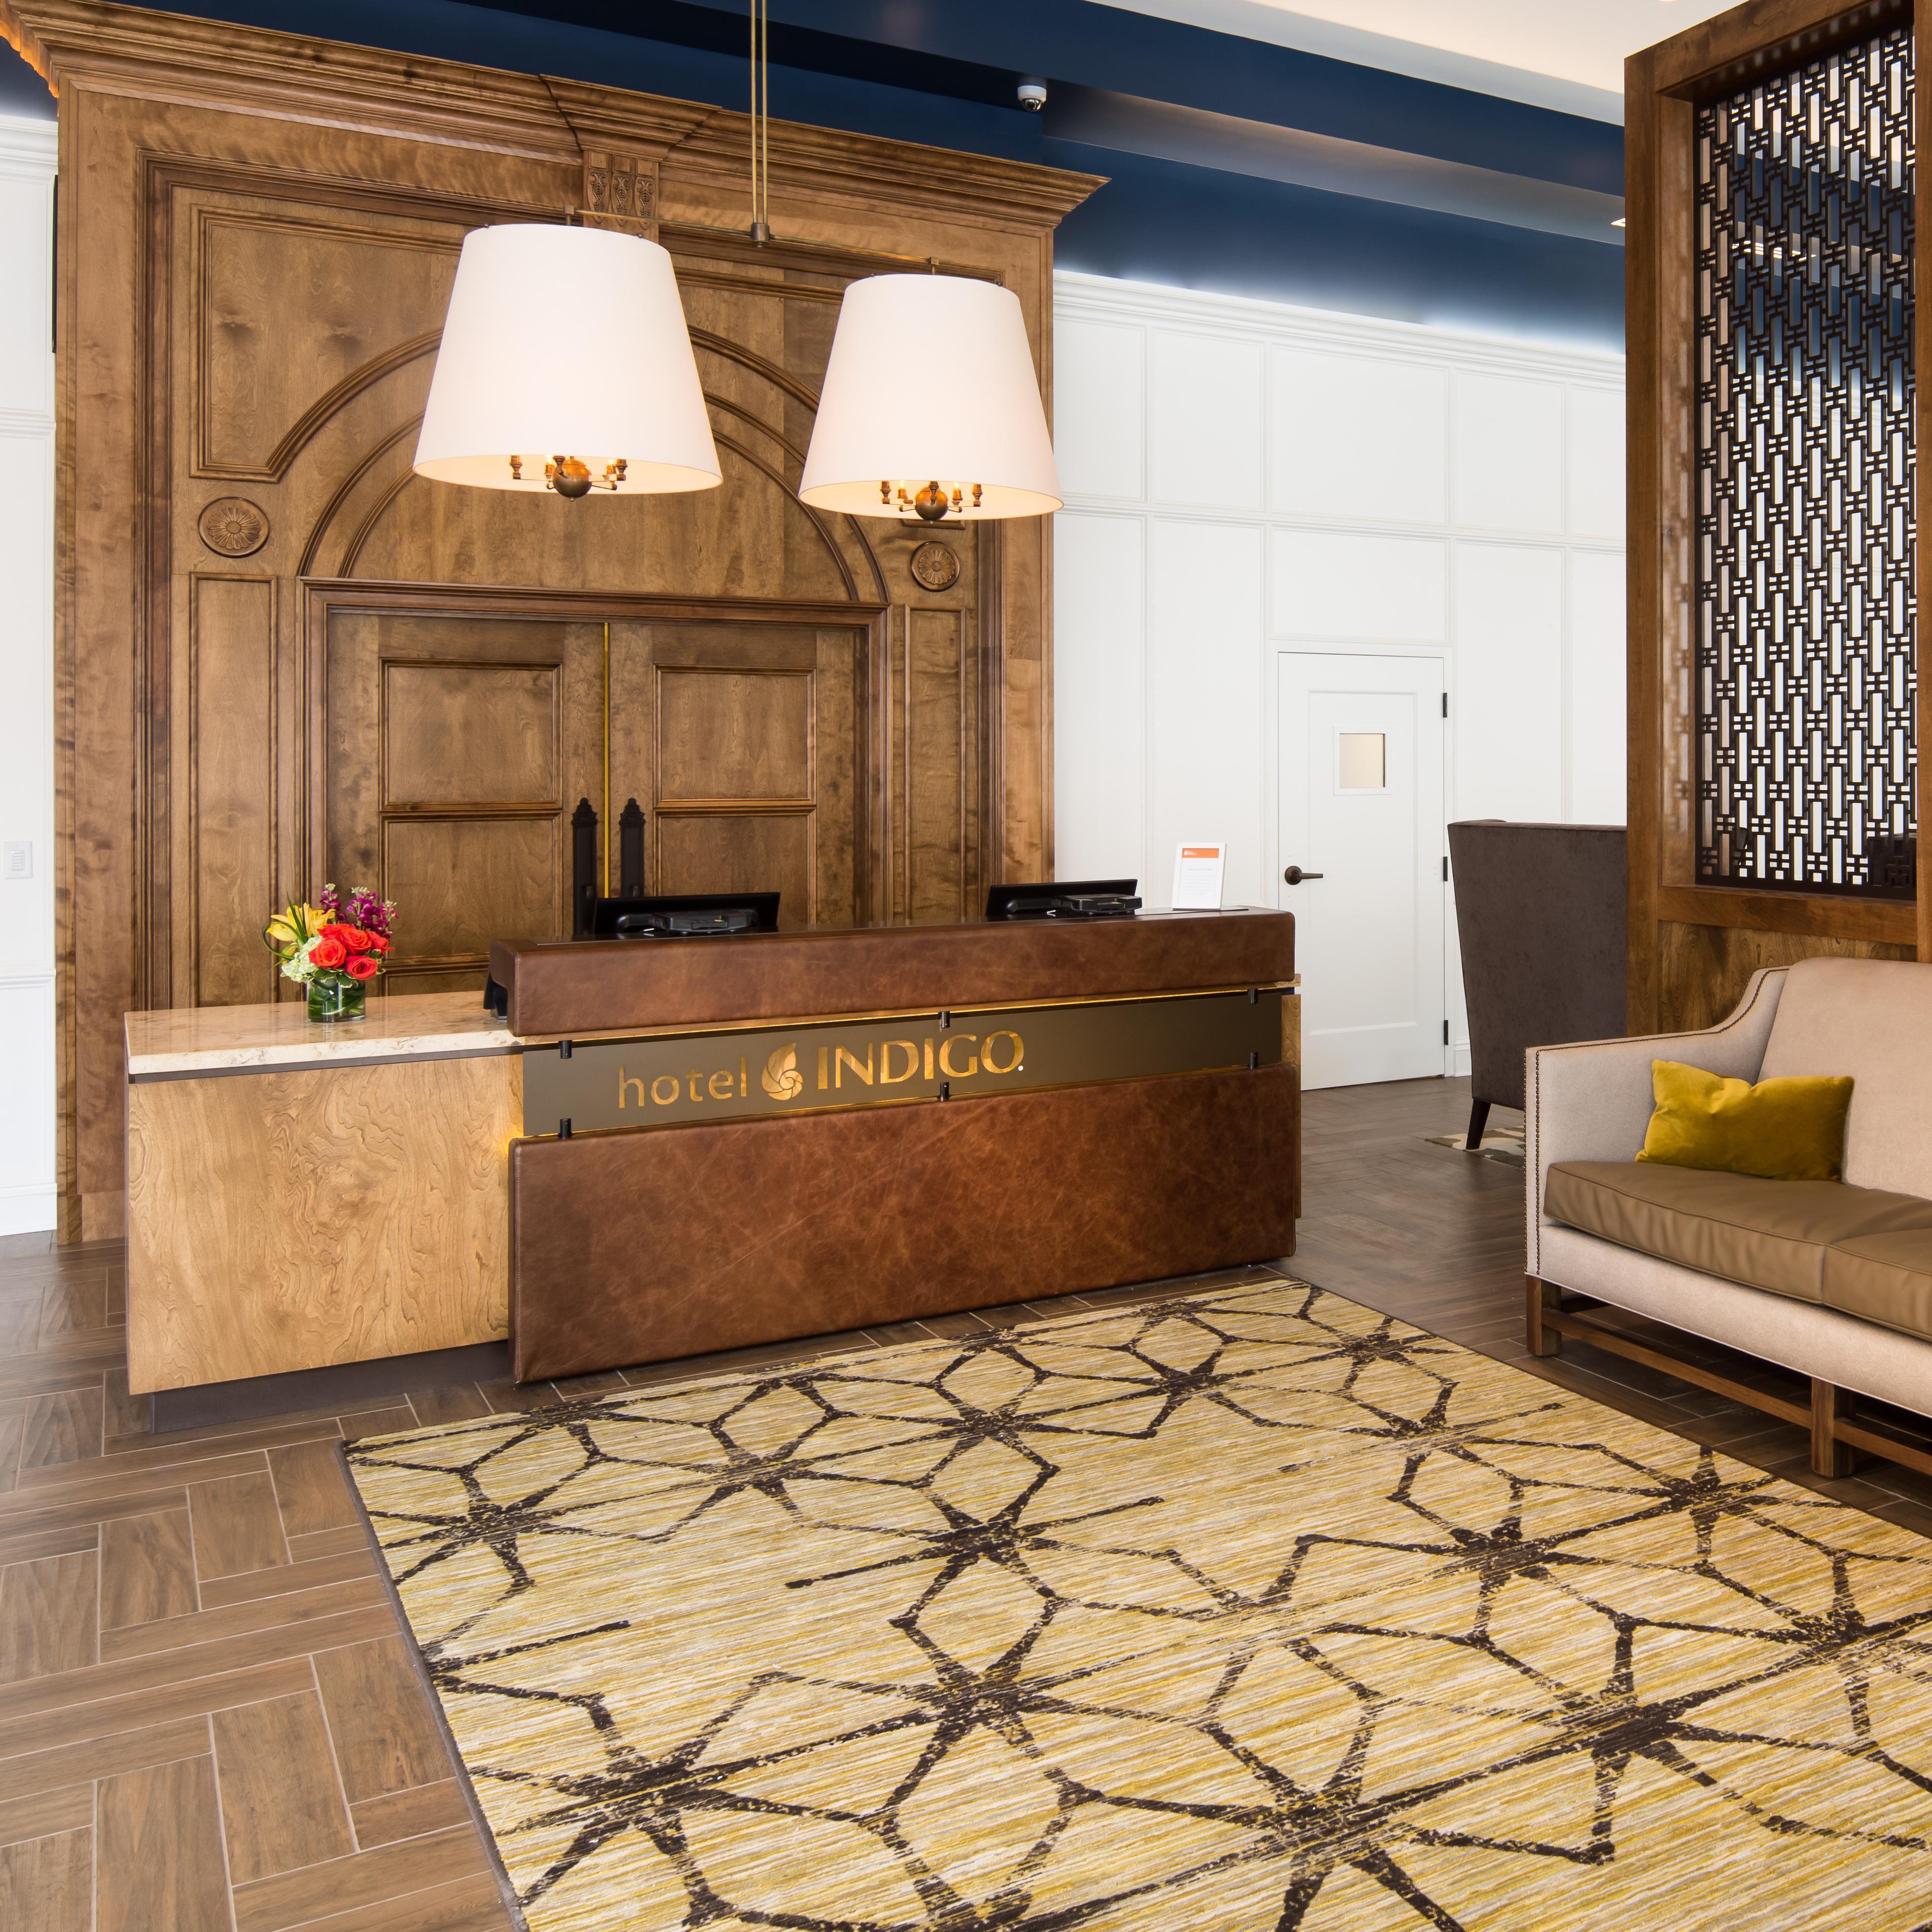 Boutique Hotels Baltimore | Hotel Indigo Baltimore Downtown | IHG on